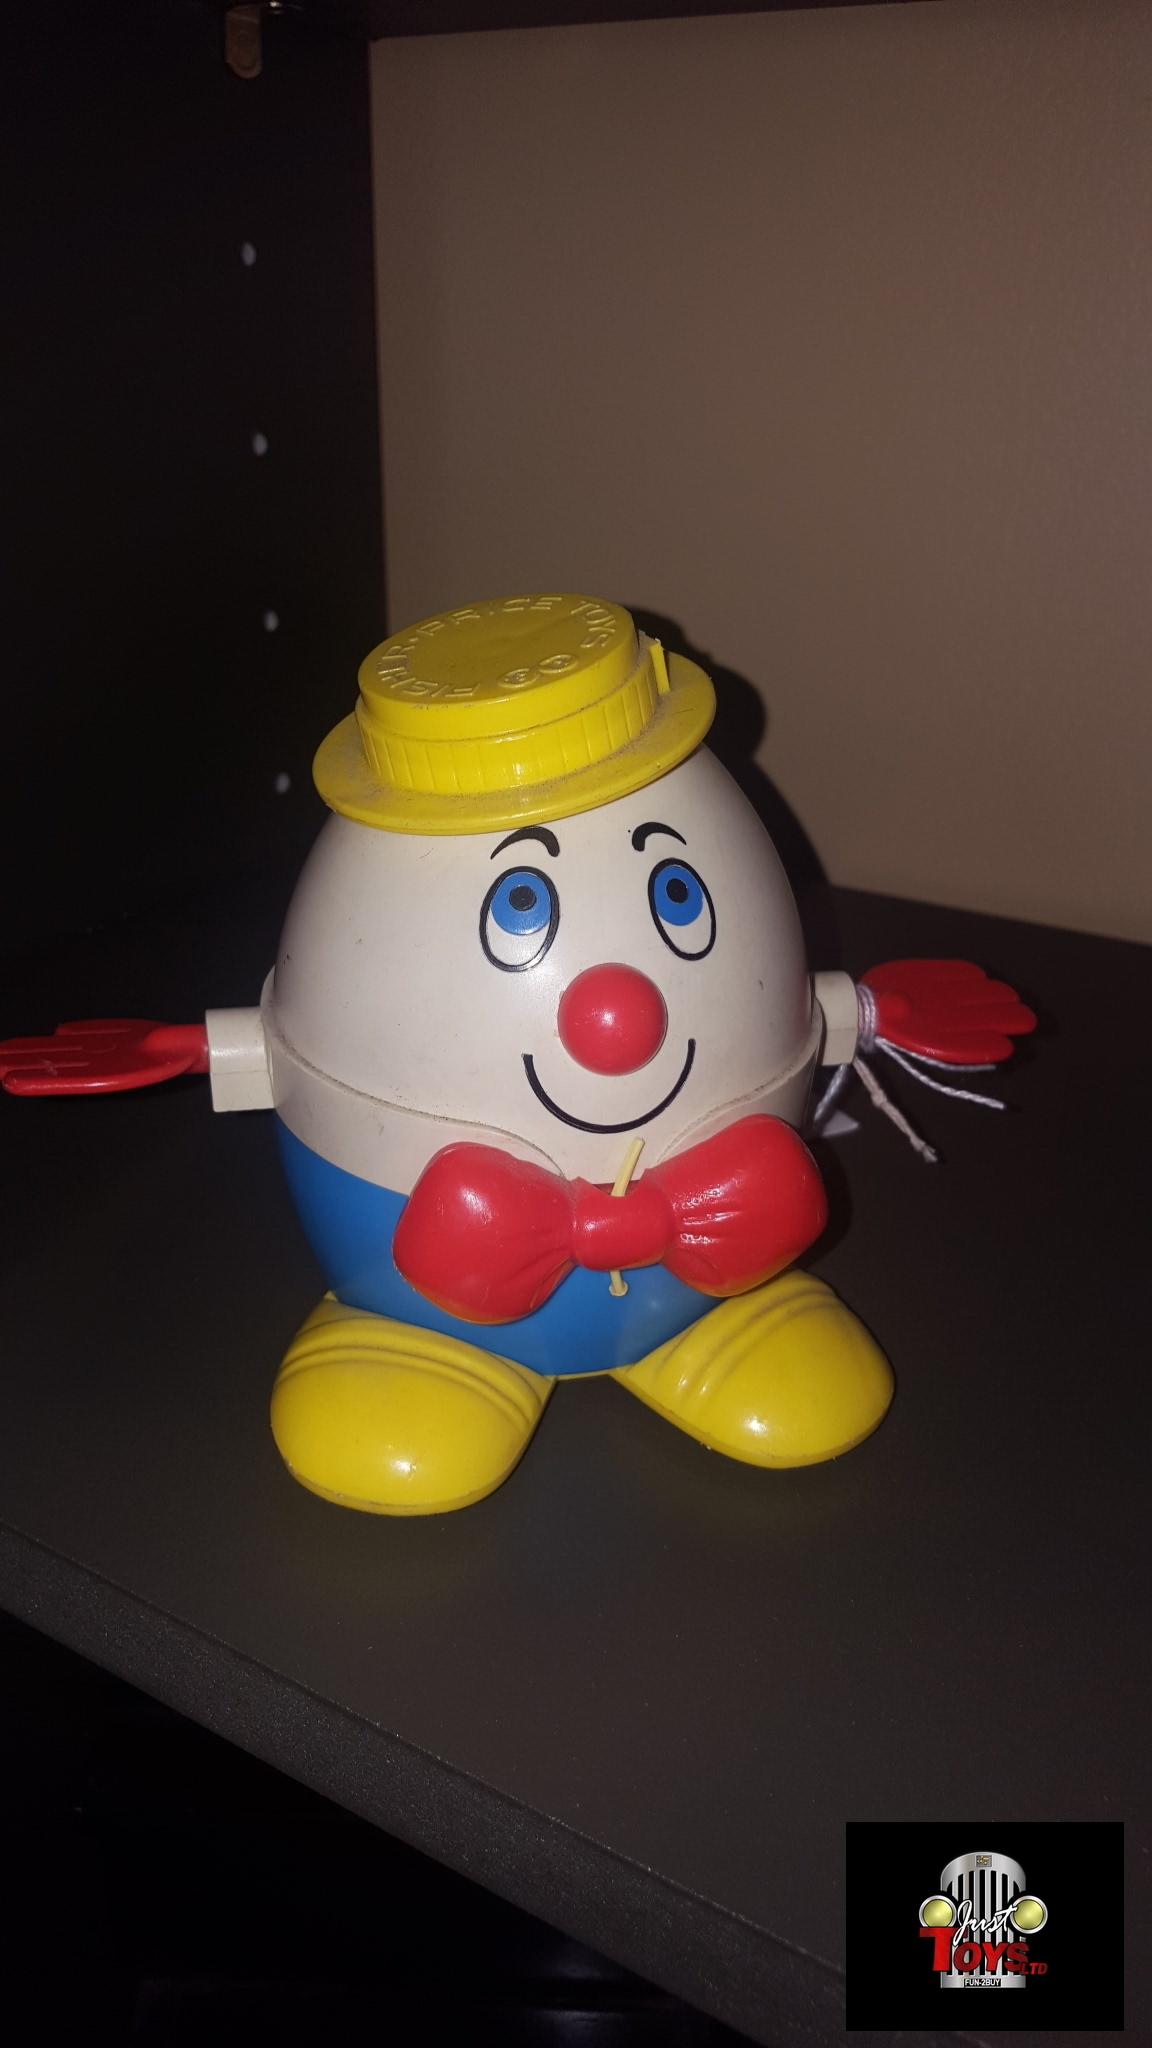 Humpty Dumpty Pull Toy